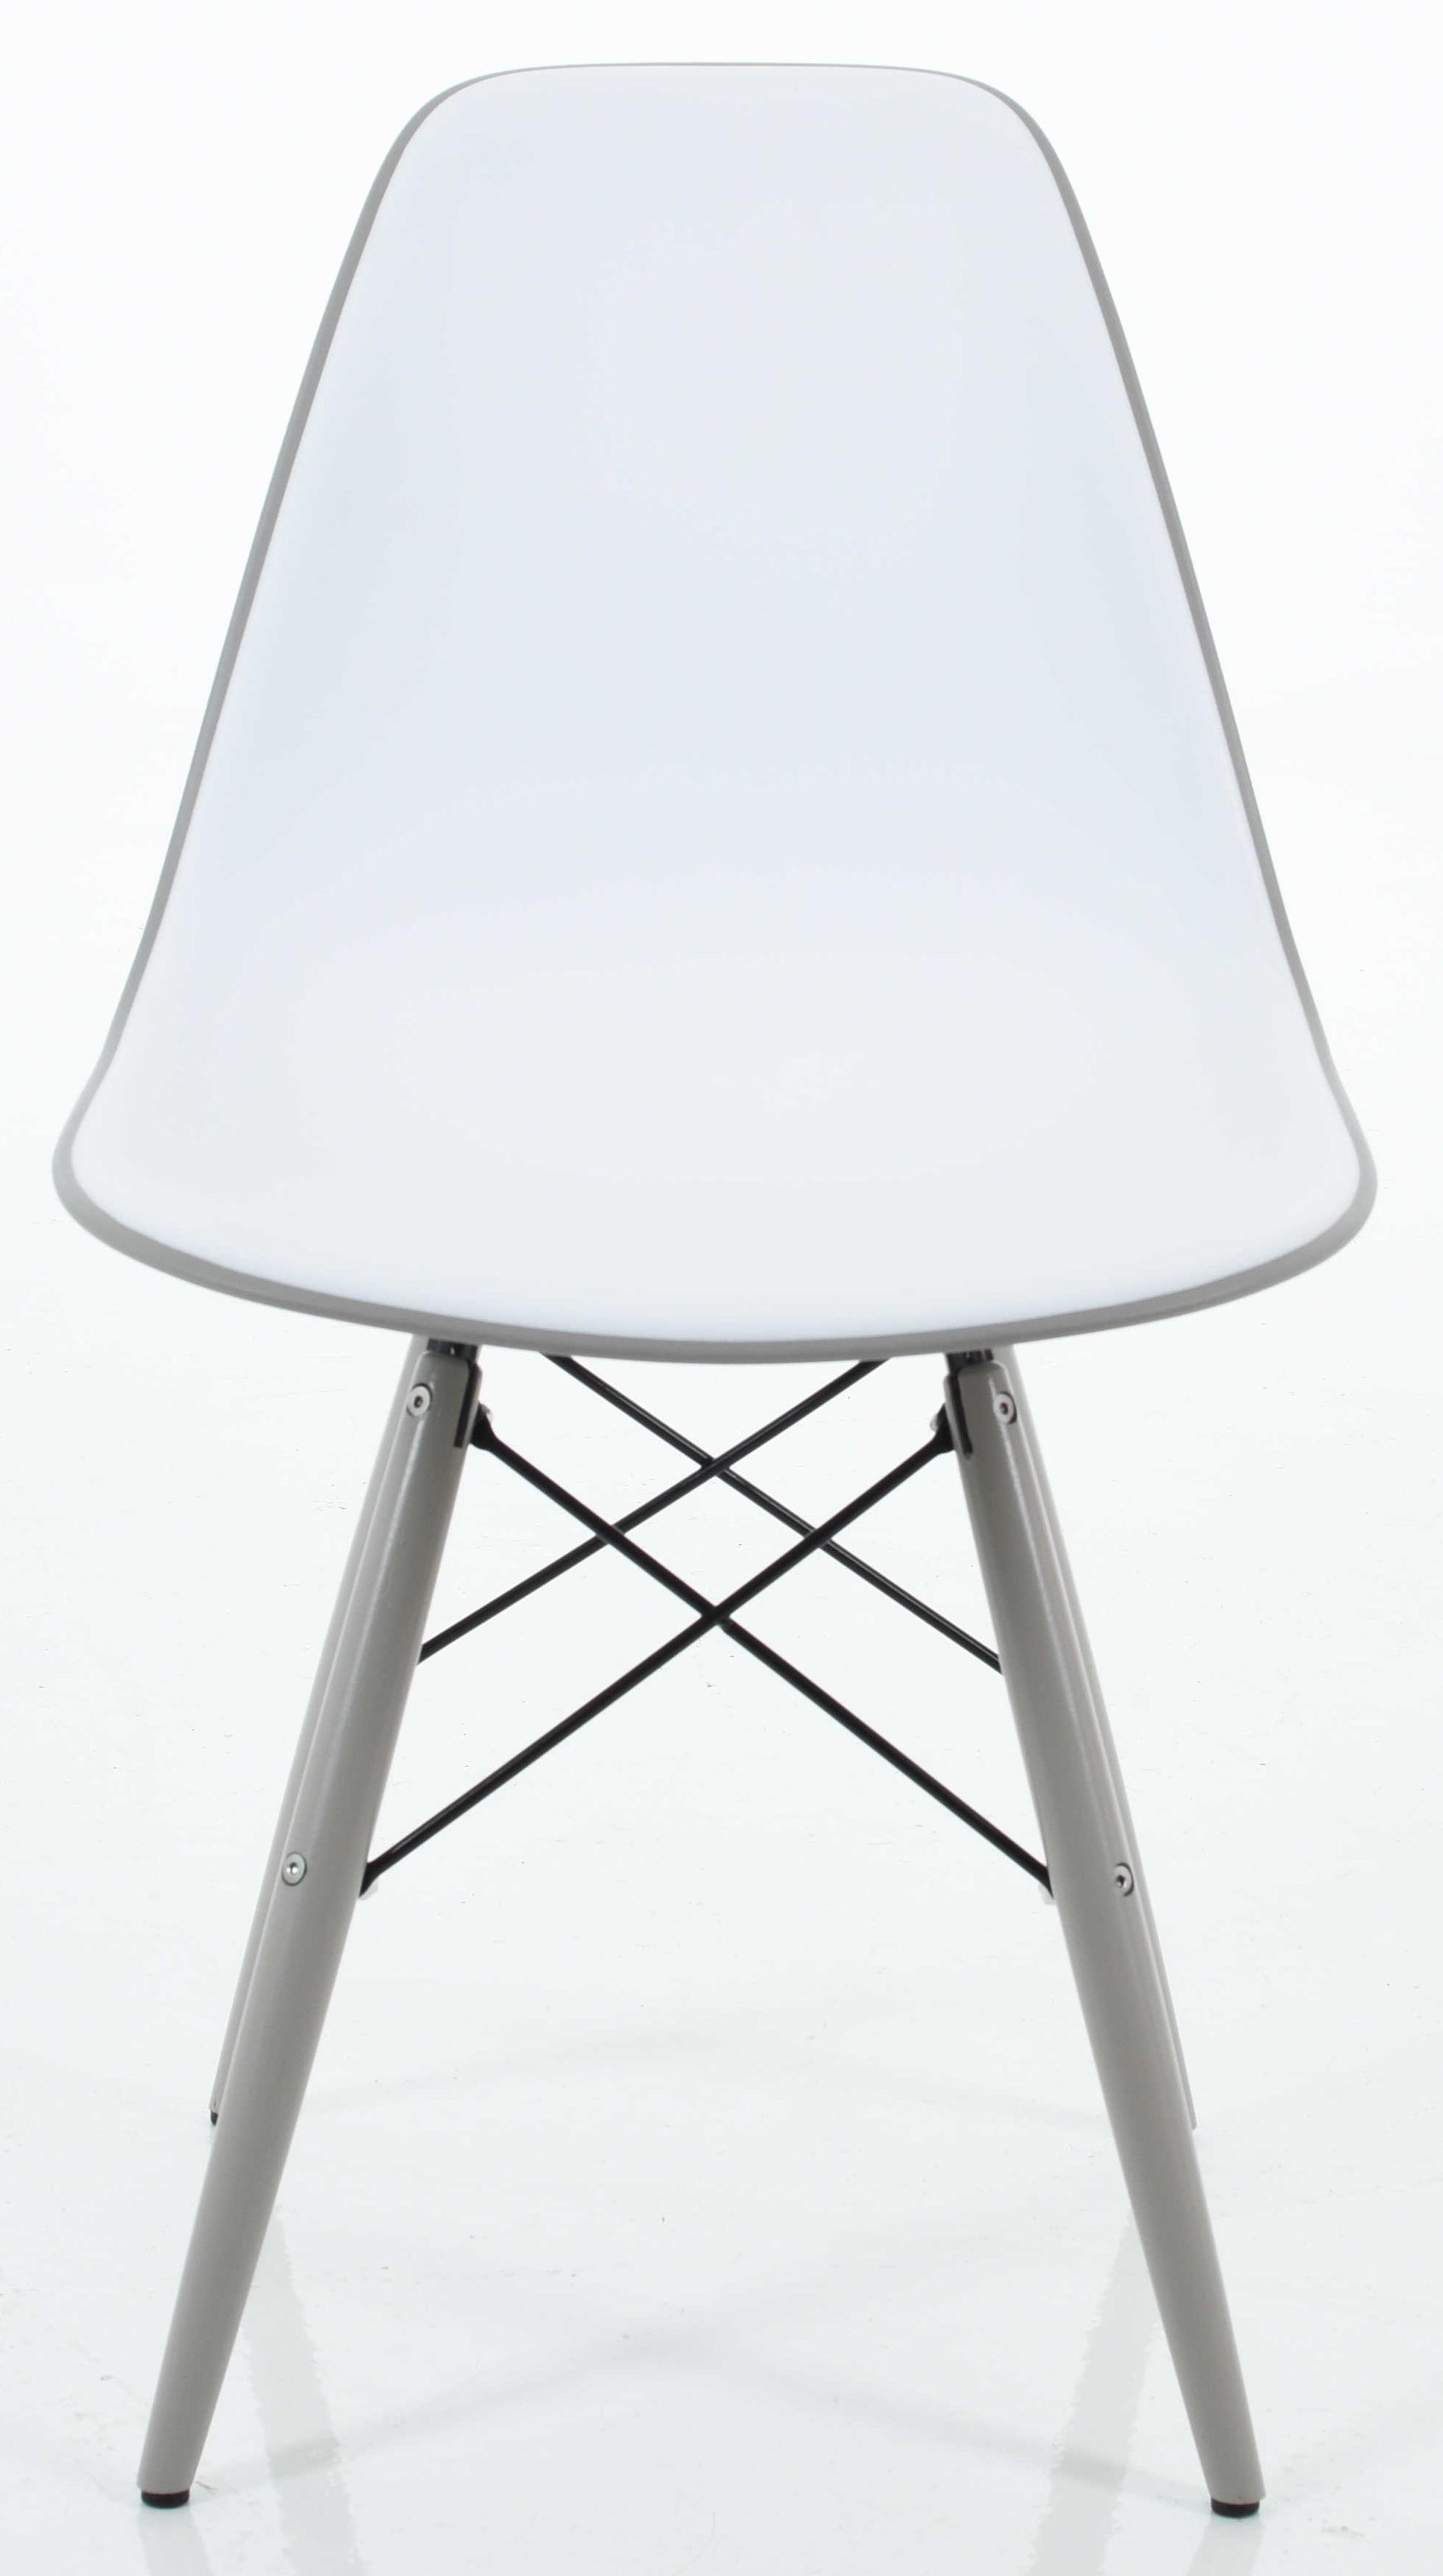 eiffel-chair-with-gray-seat.jpg